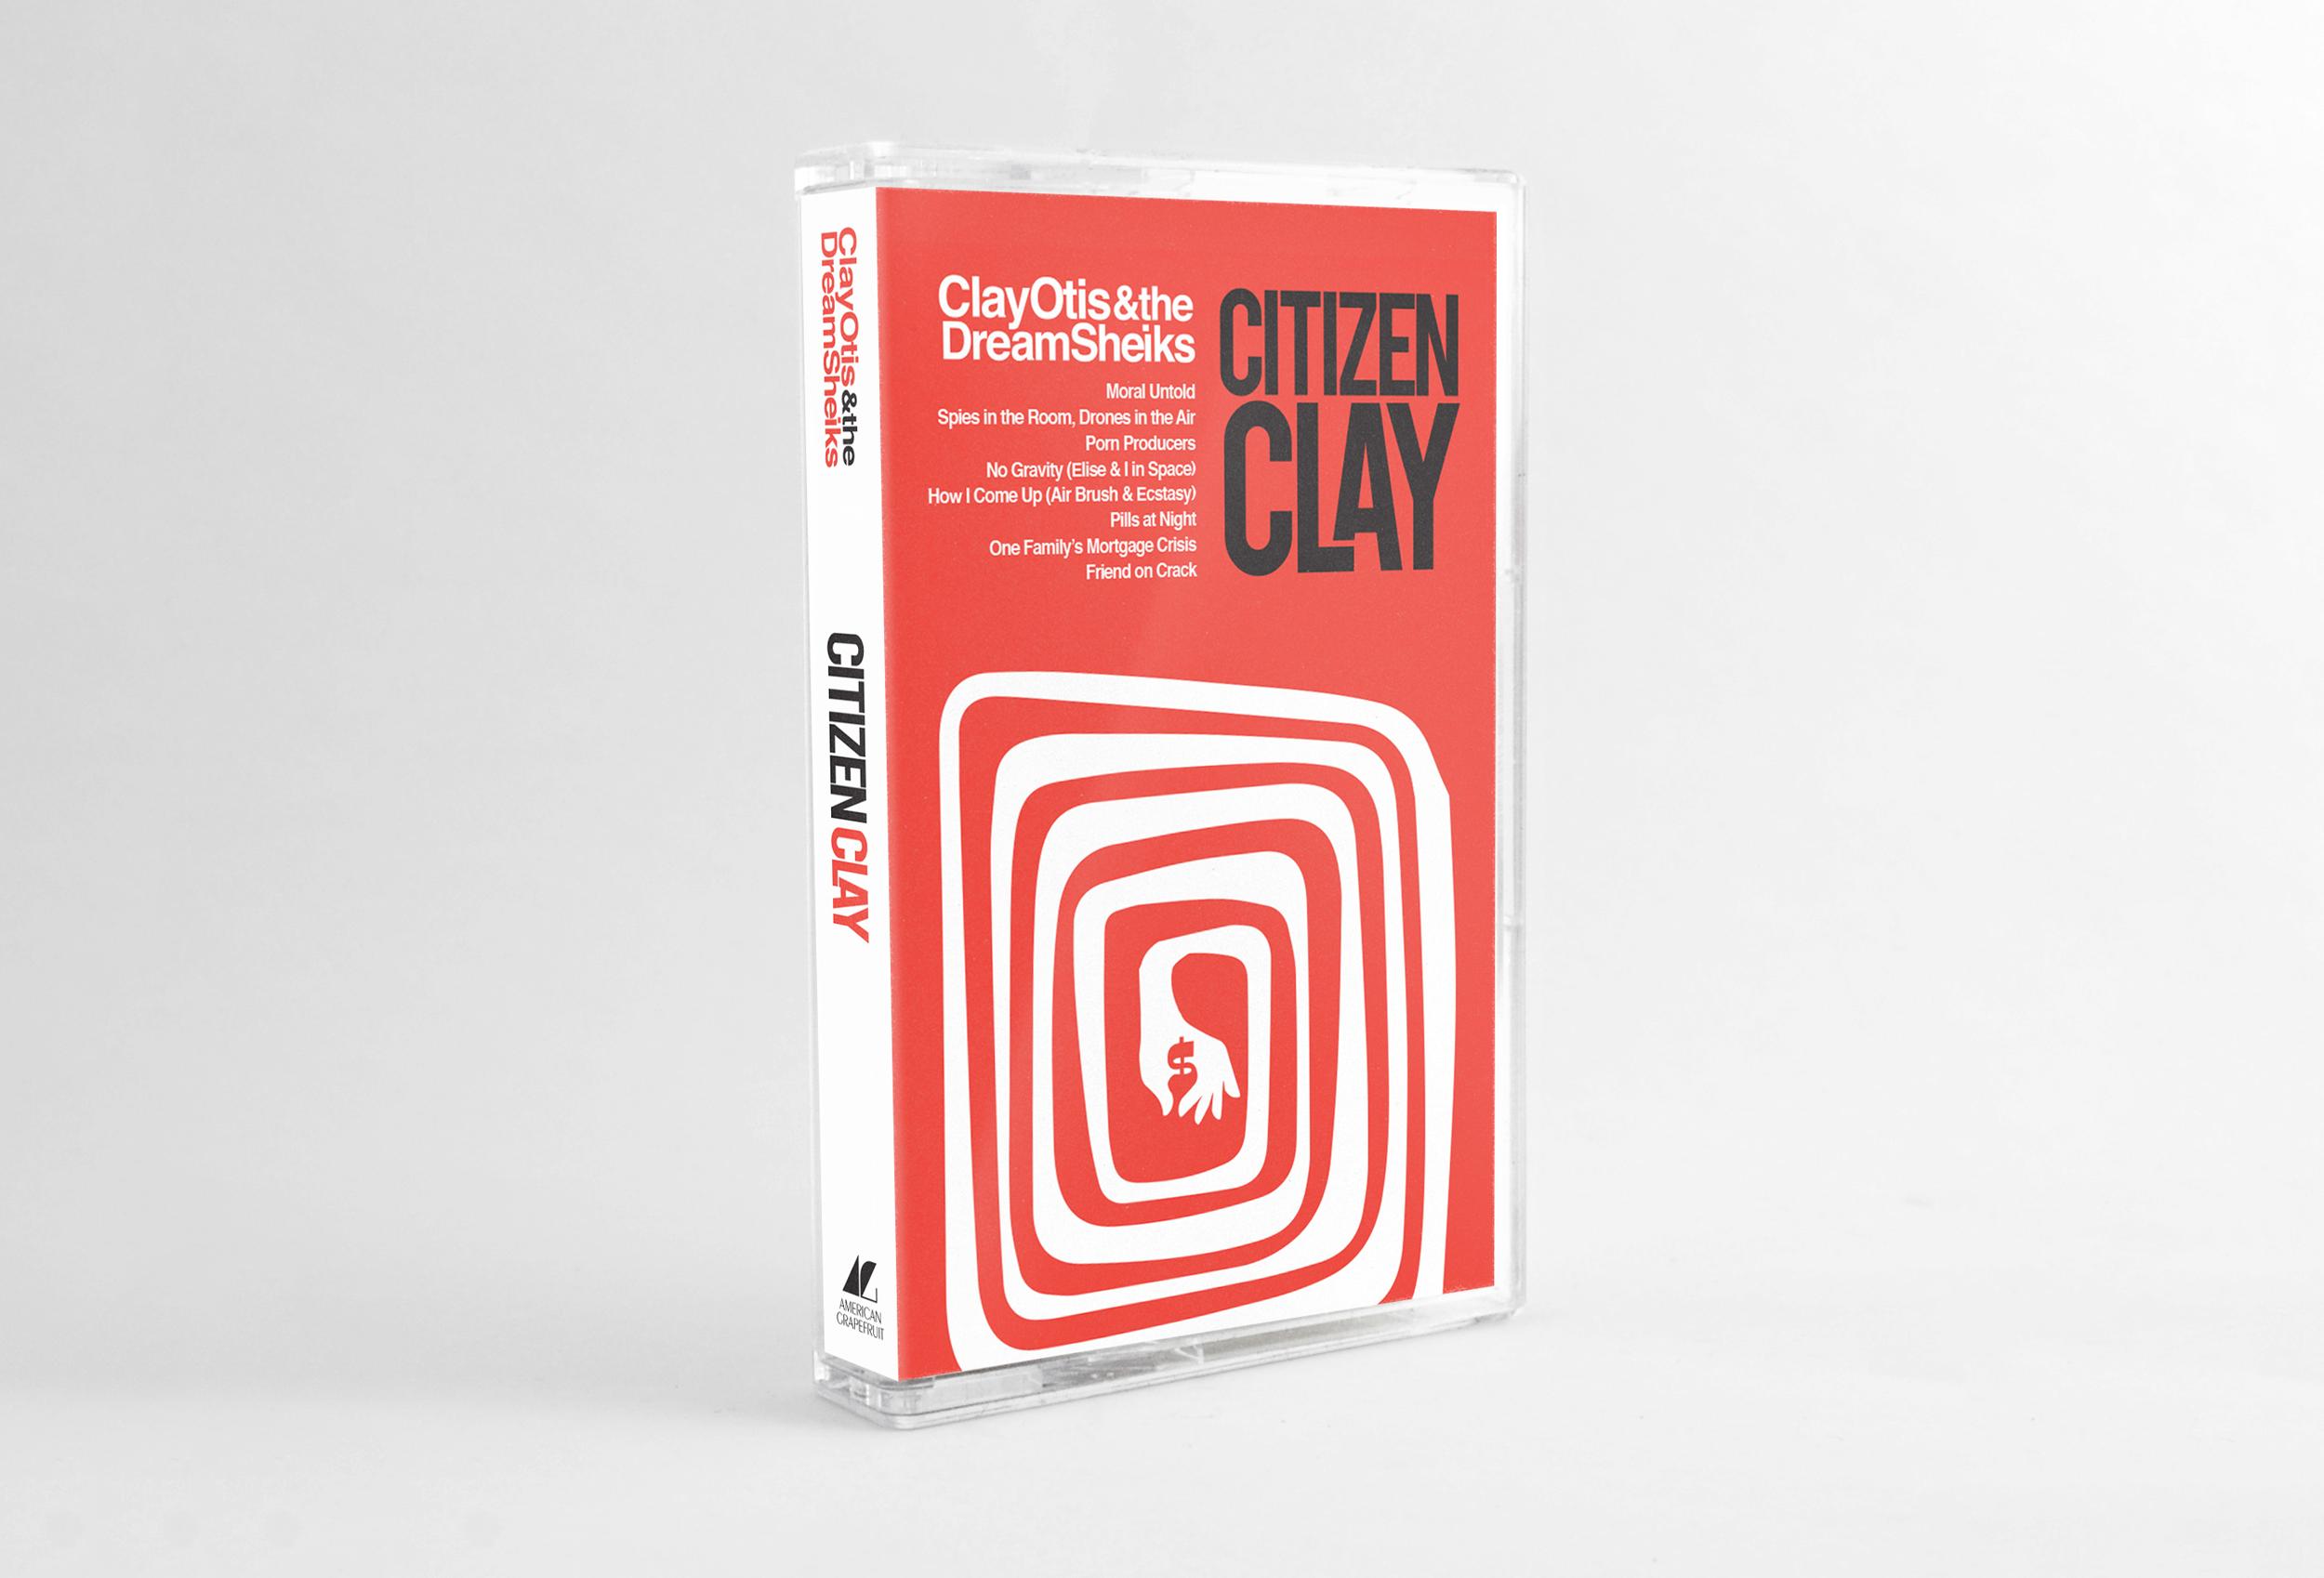 Citizen-Clay-Cassette-Cover-Mockup1.jpg